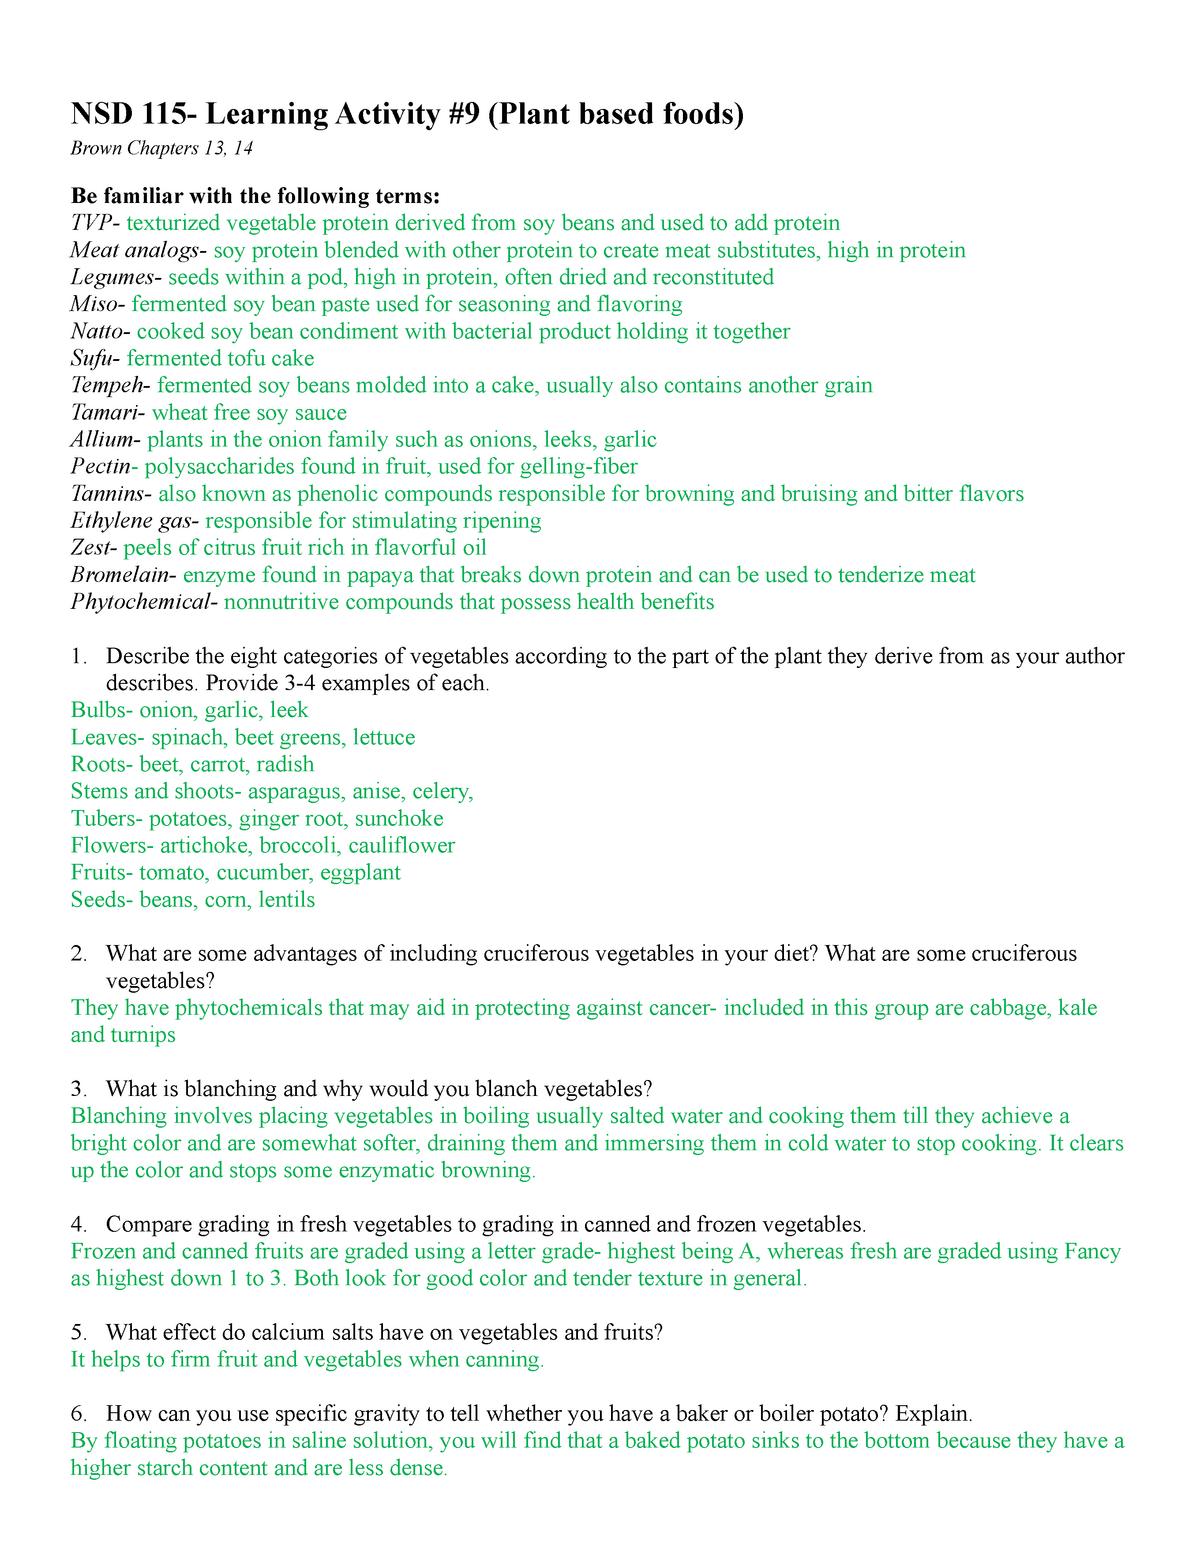 Learning Activity #9 - NSD 115 : Food Science I - StuDocu